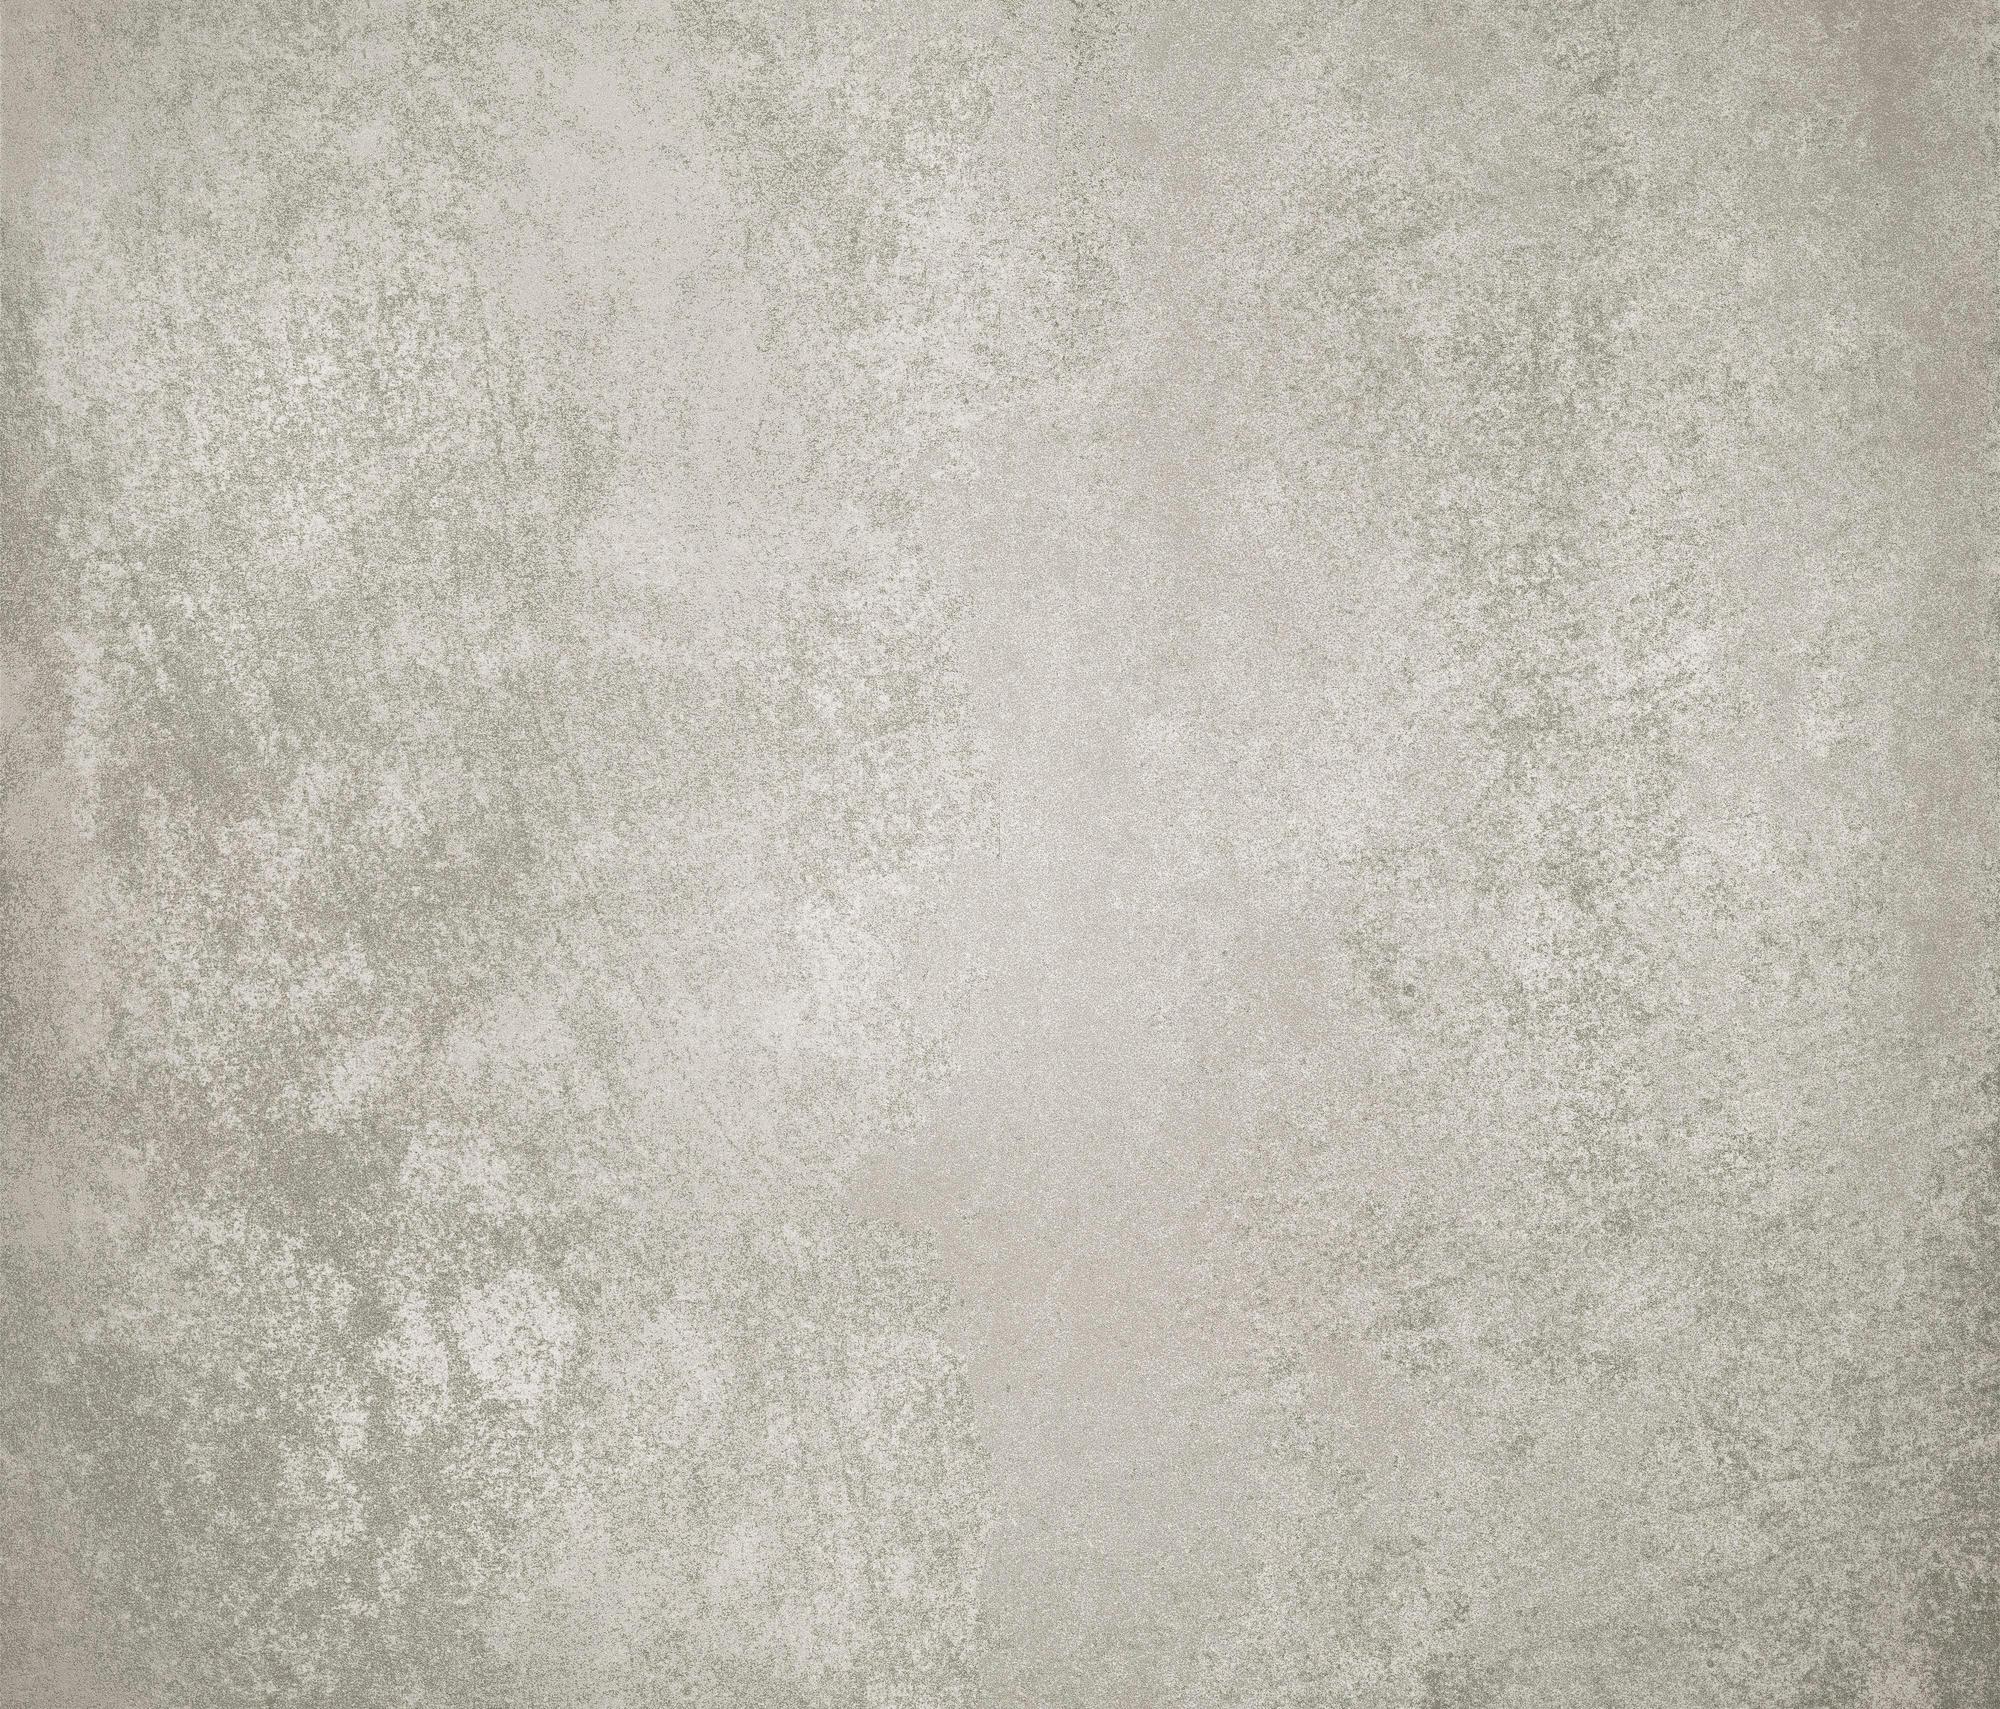 evoque grey floor floor tiles from fap ceramiche. Black Bedroom Furniture Sets. Home Design Ideas